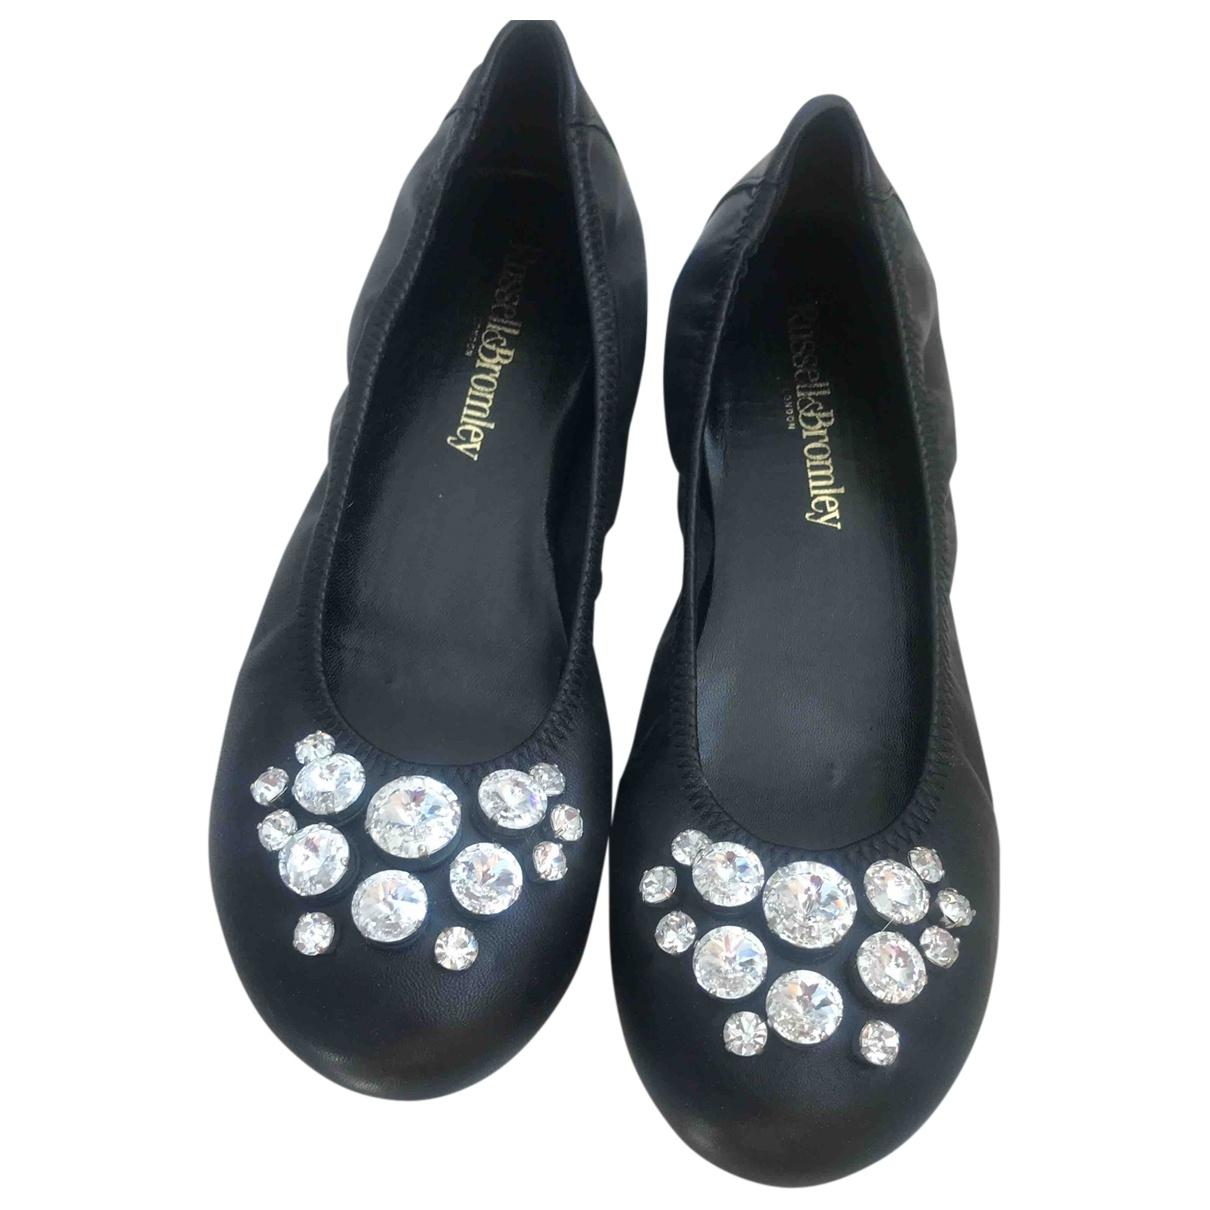 Russell & Bromley \N Ballerinas in  Schwarz Leder